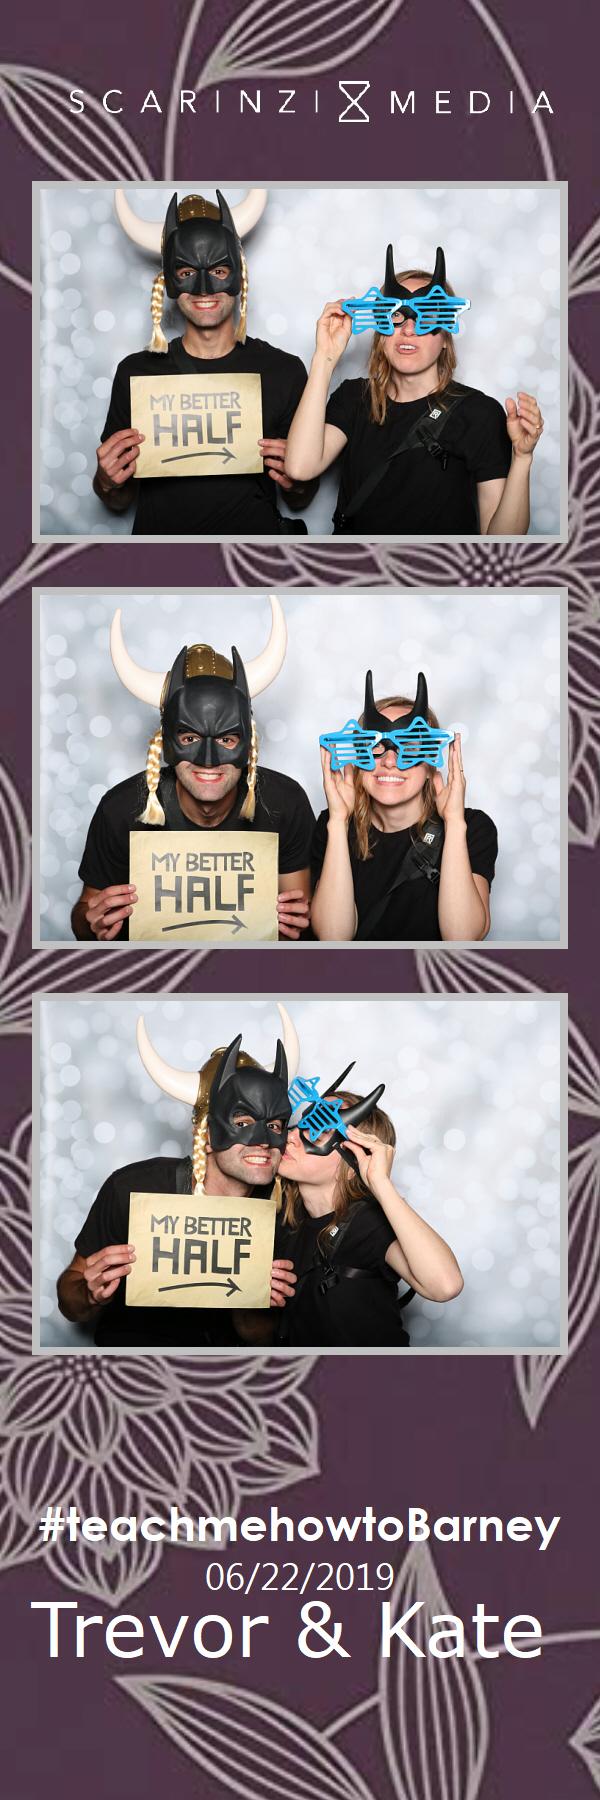 2019.06.22 - Barney Wedding PHOTOBOOTH46.jpg